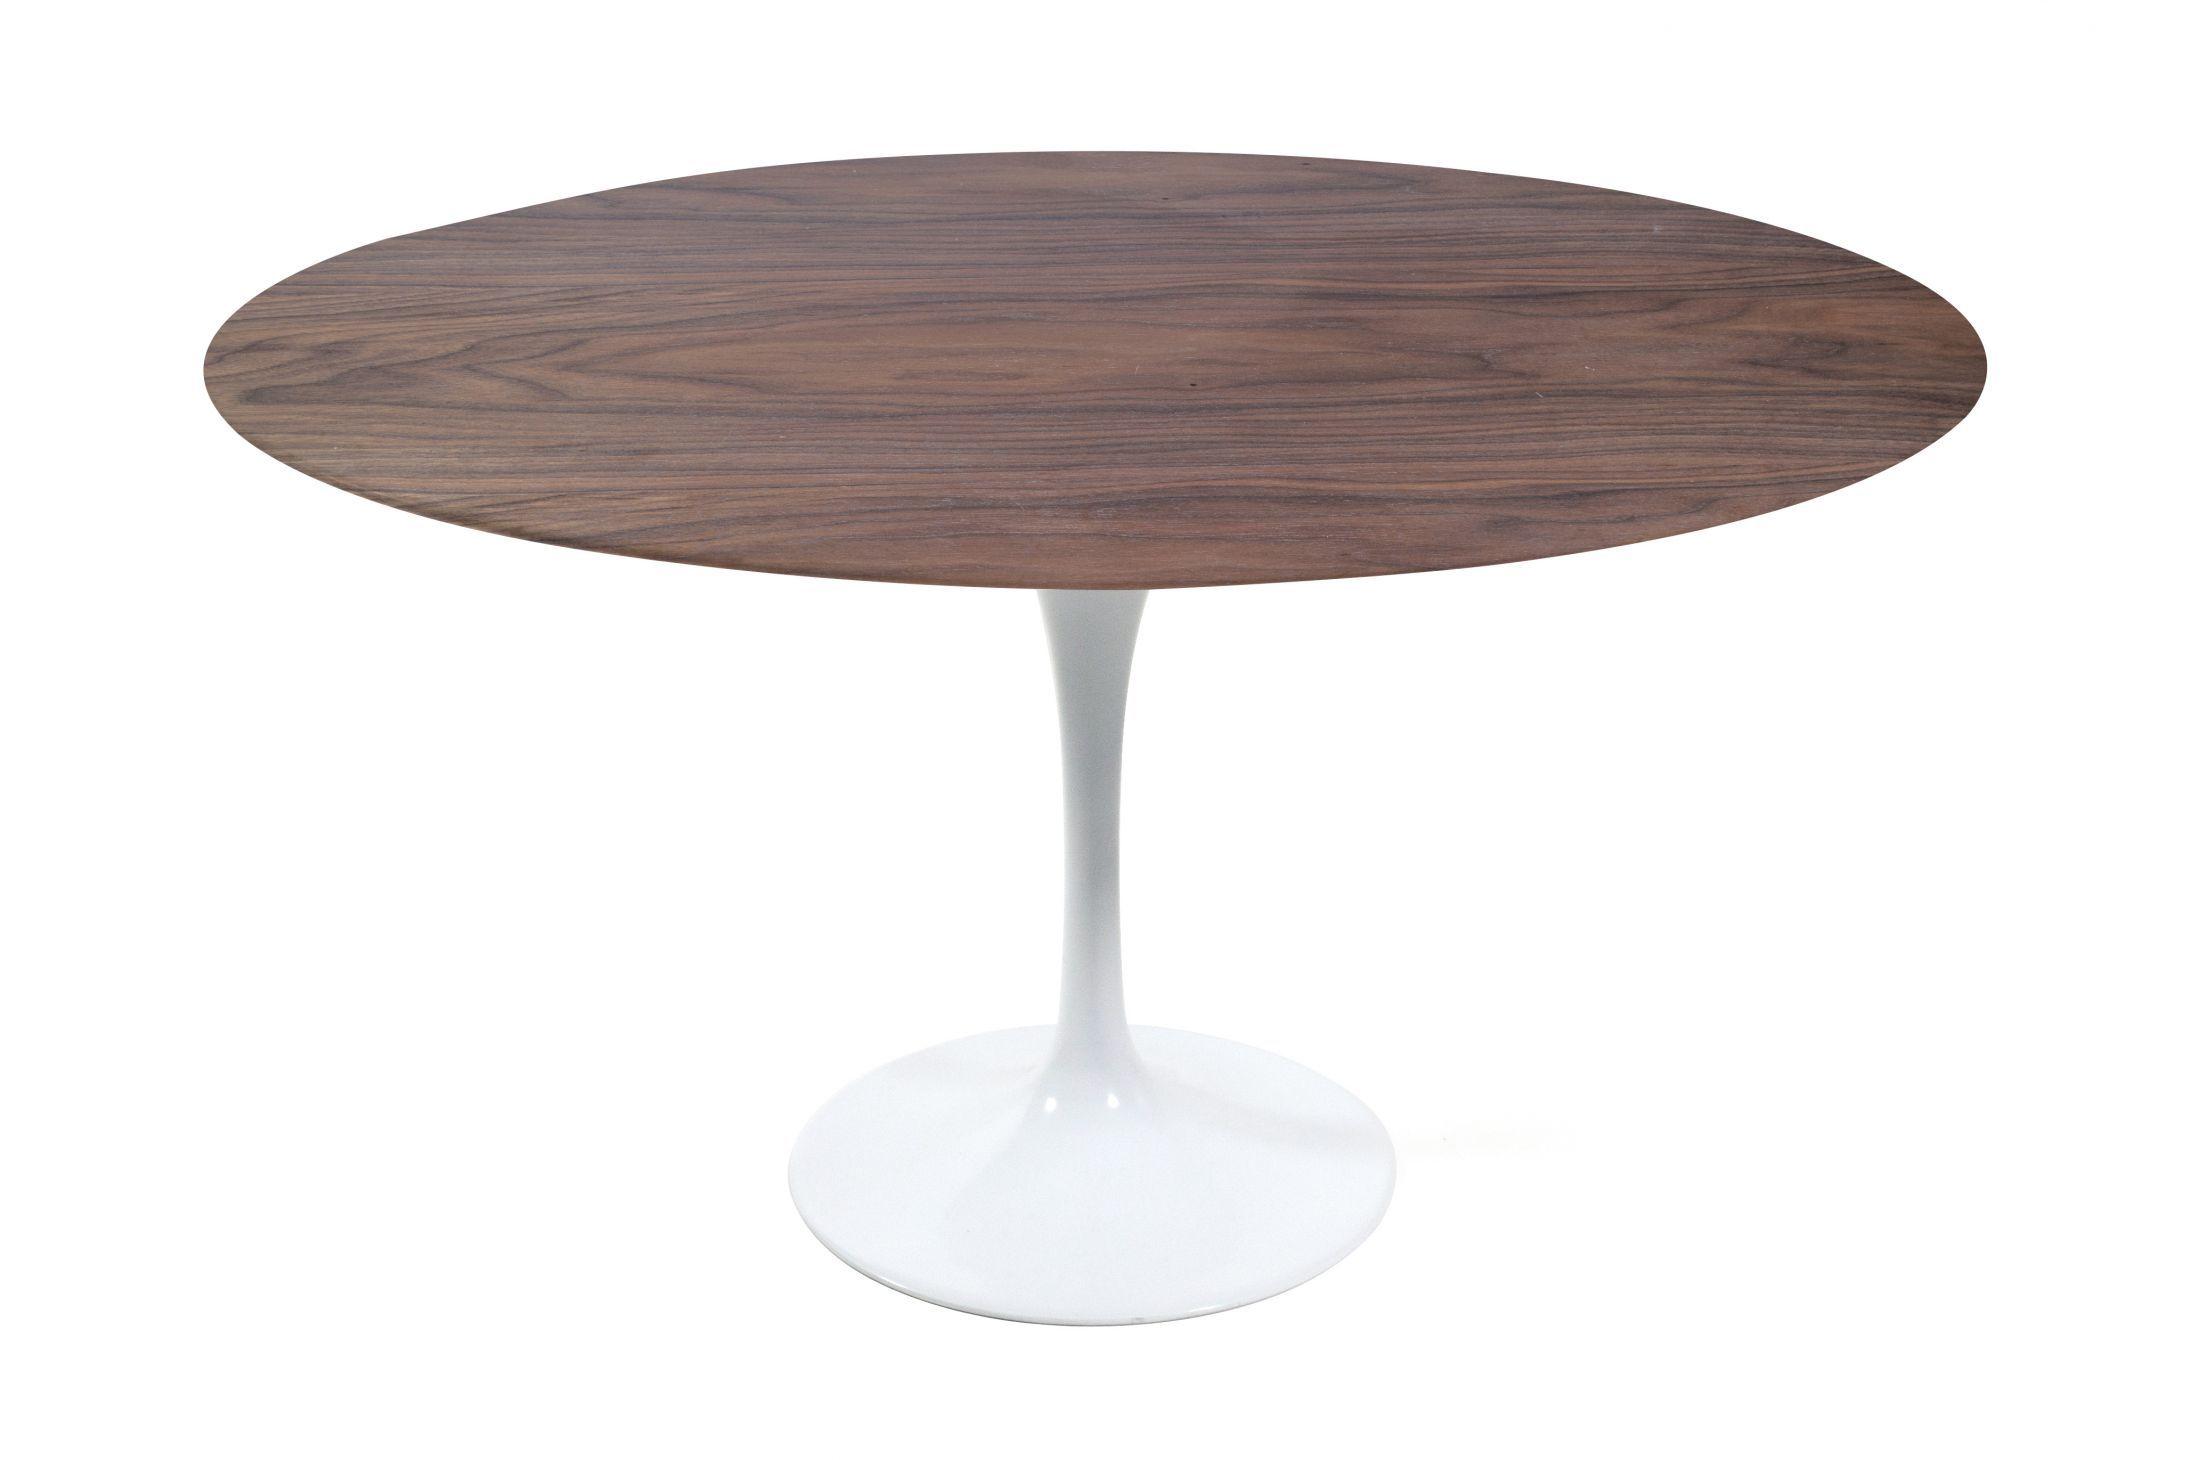 Tulip Table Round Walnut Tulip Table Woods And Walnut Veneer # Muebles Eero Saarinen